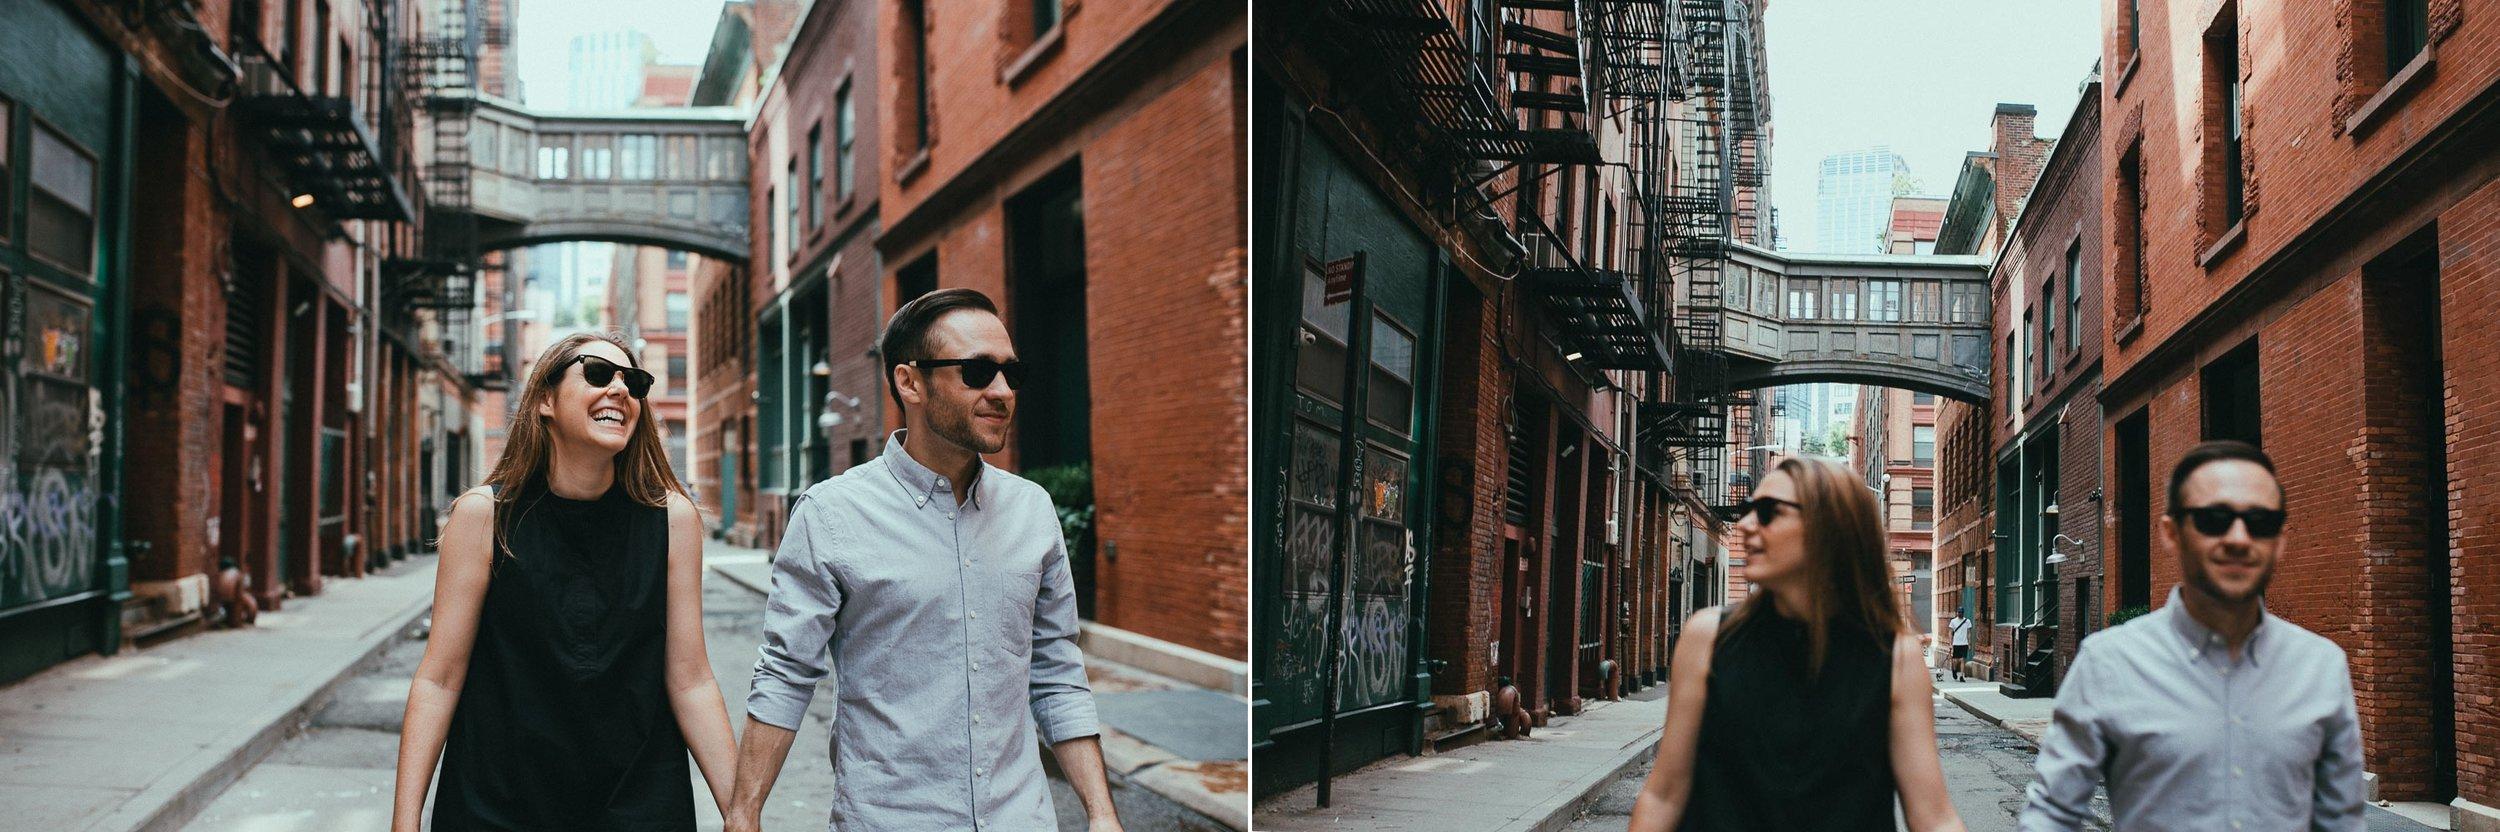 new-york-city-engagement14.jpg